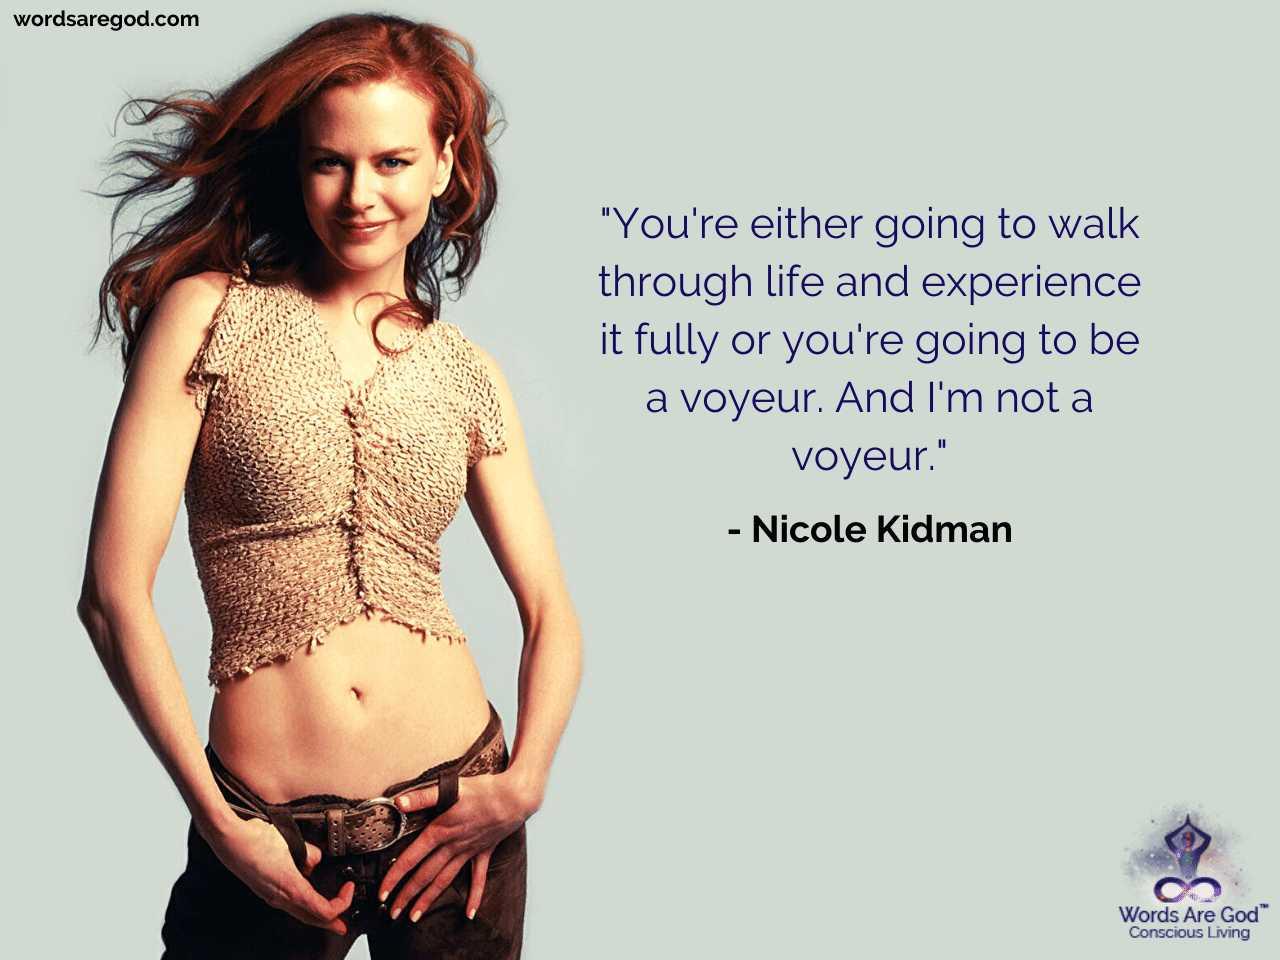 Nicole Kidman Best Quote by Nicole Kidman